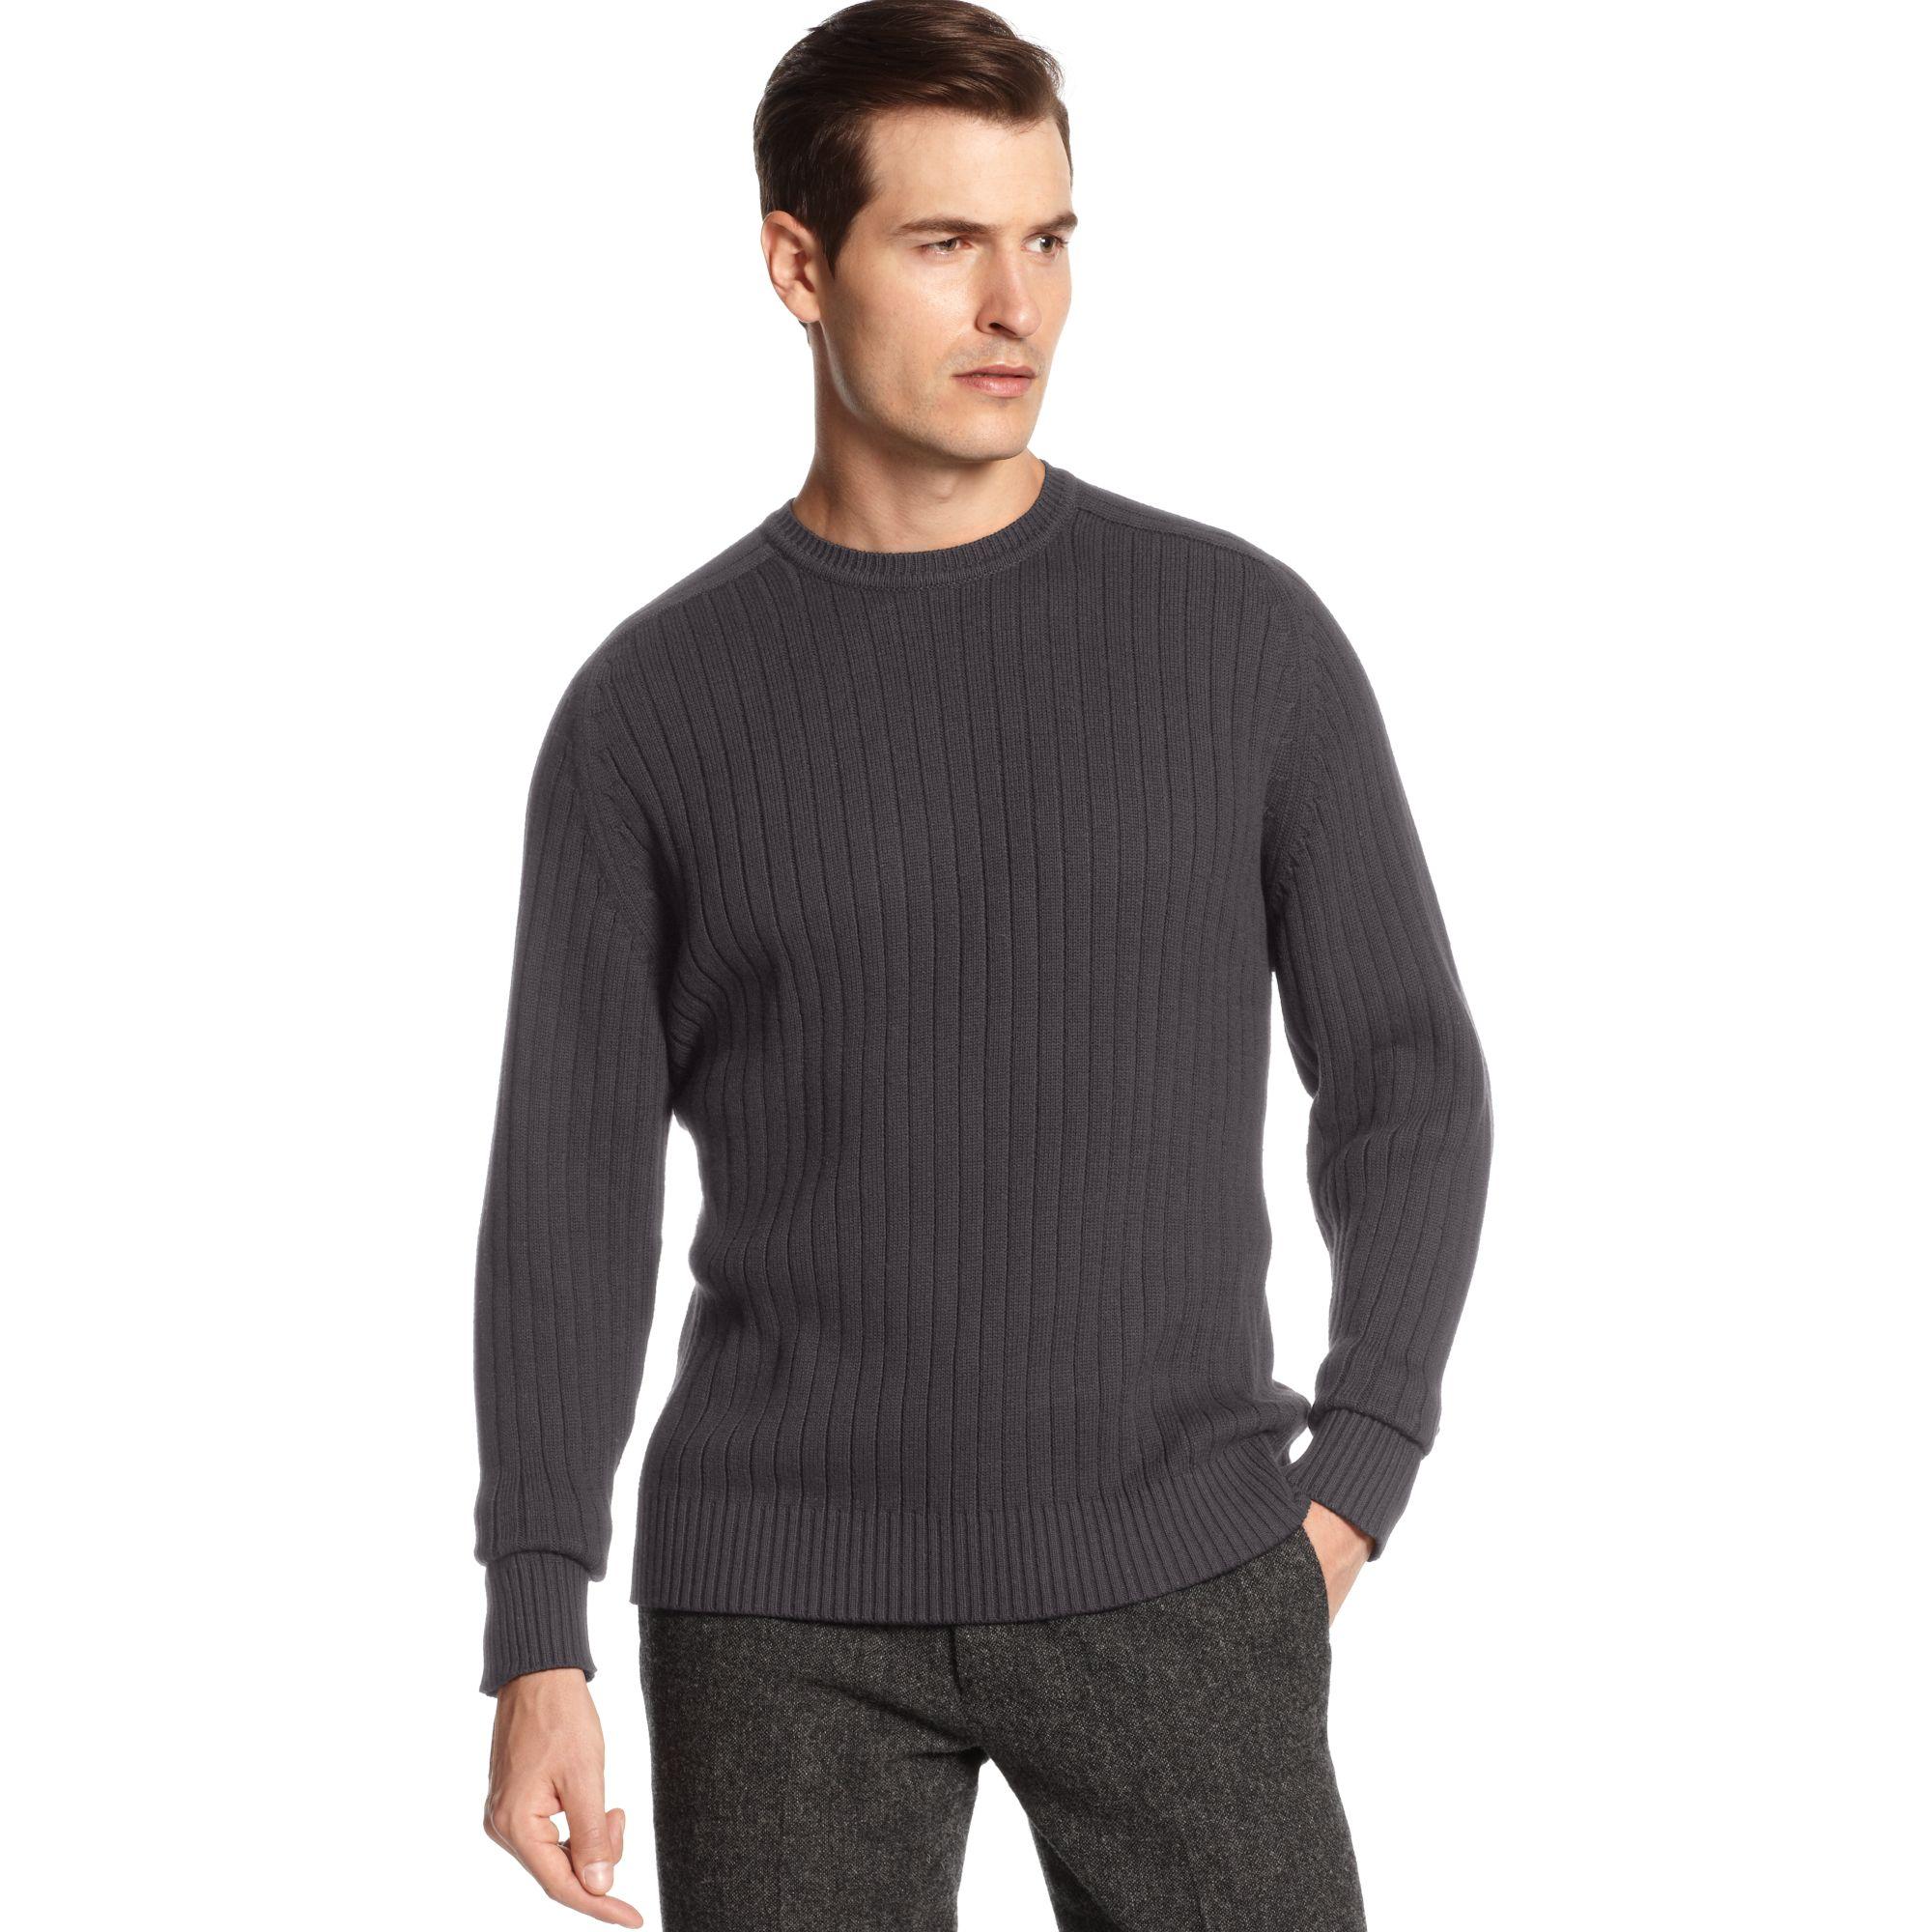 Oscar De La Renta Mens Sweater Sweater Grey